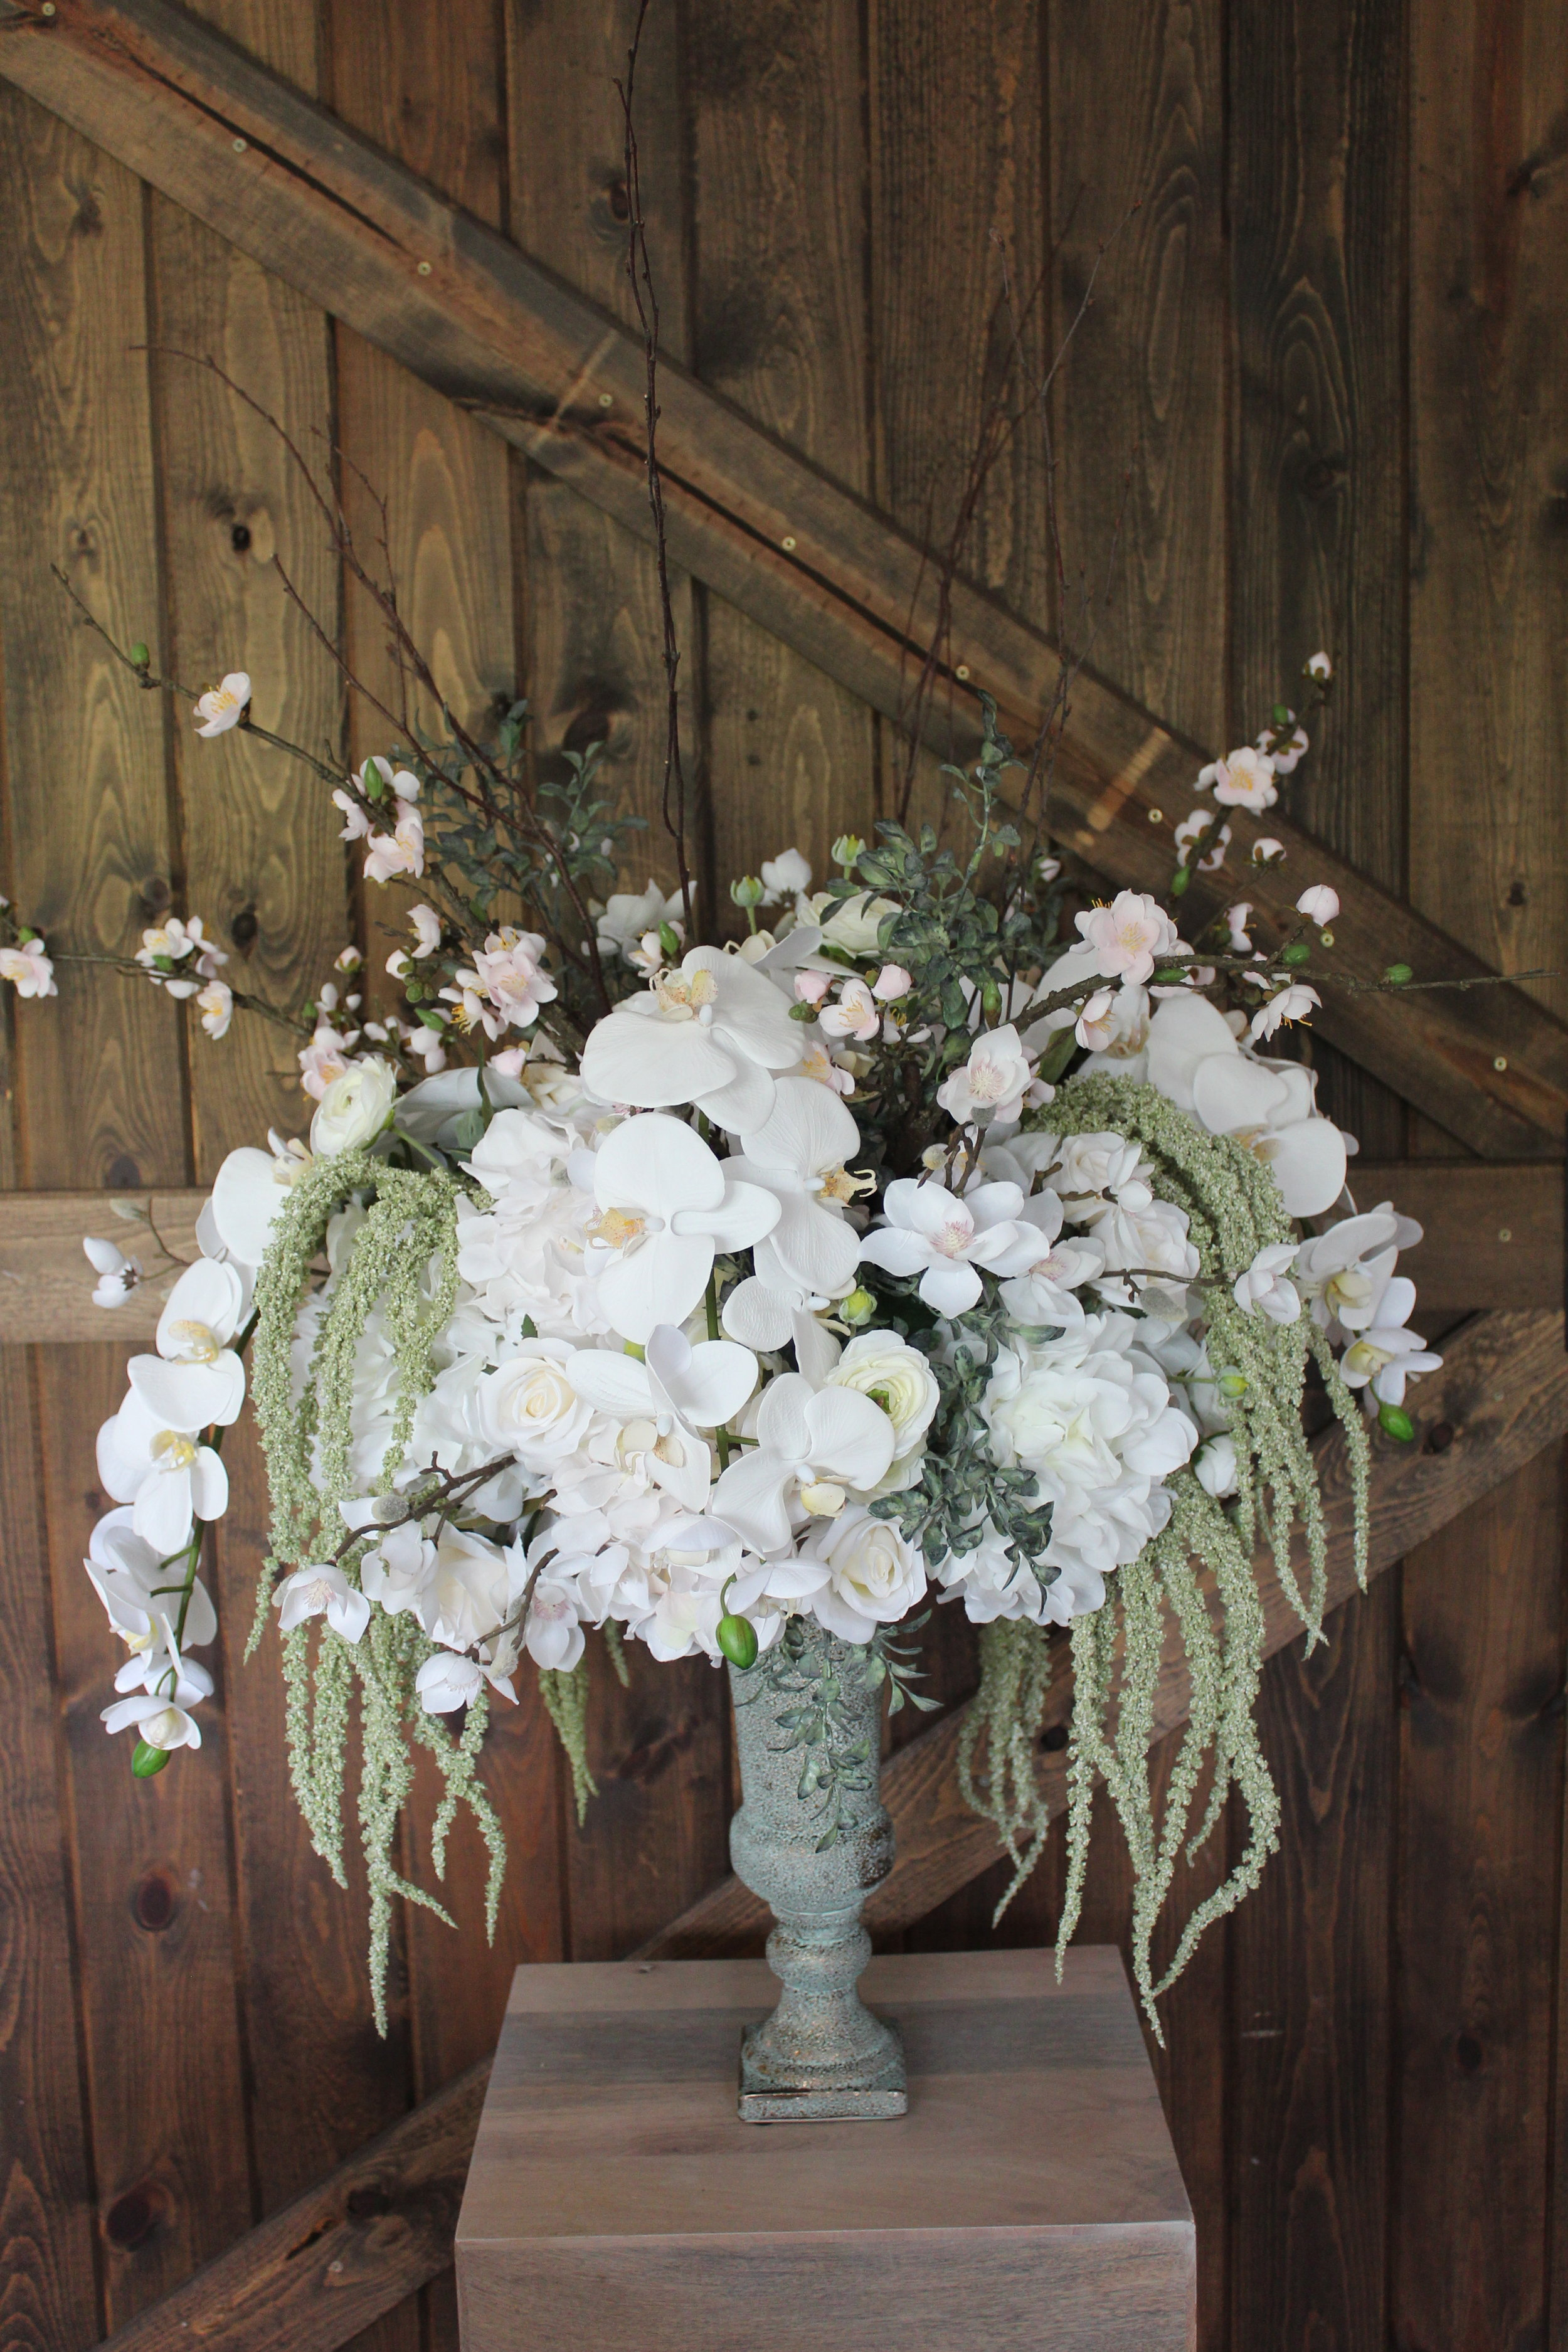 silk-wedding-flowers-centerpiece-custom-bridal-bouquets.jpg